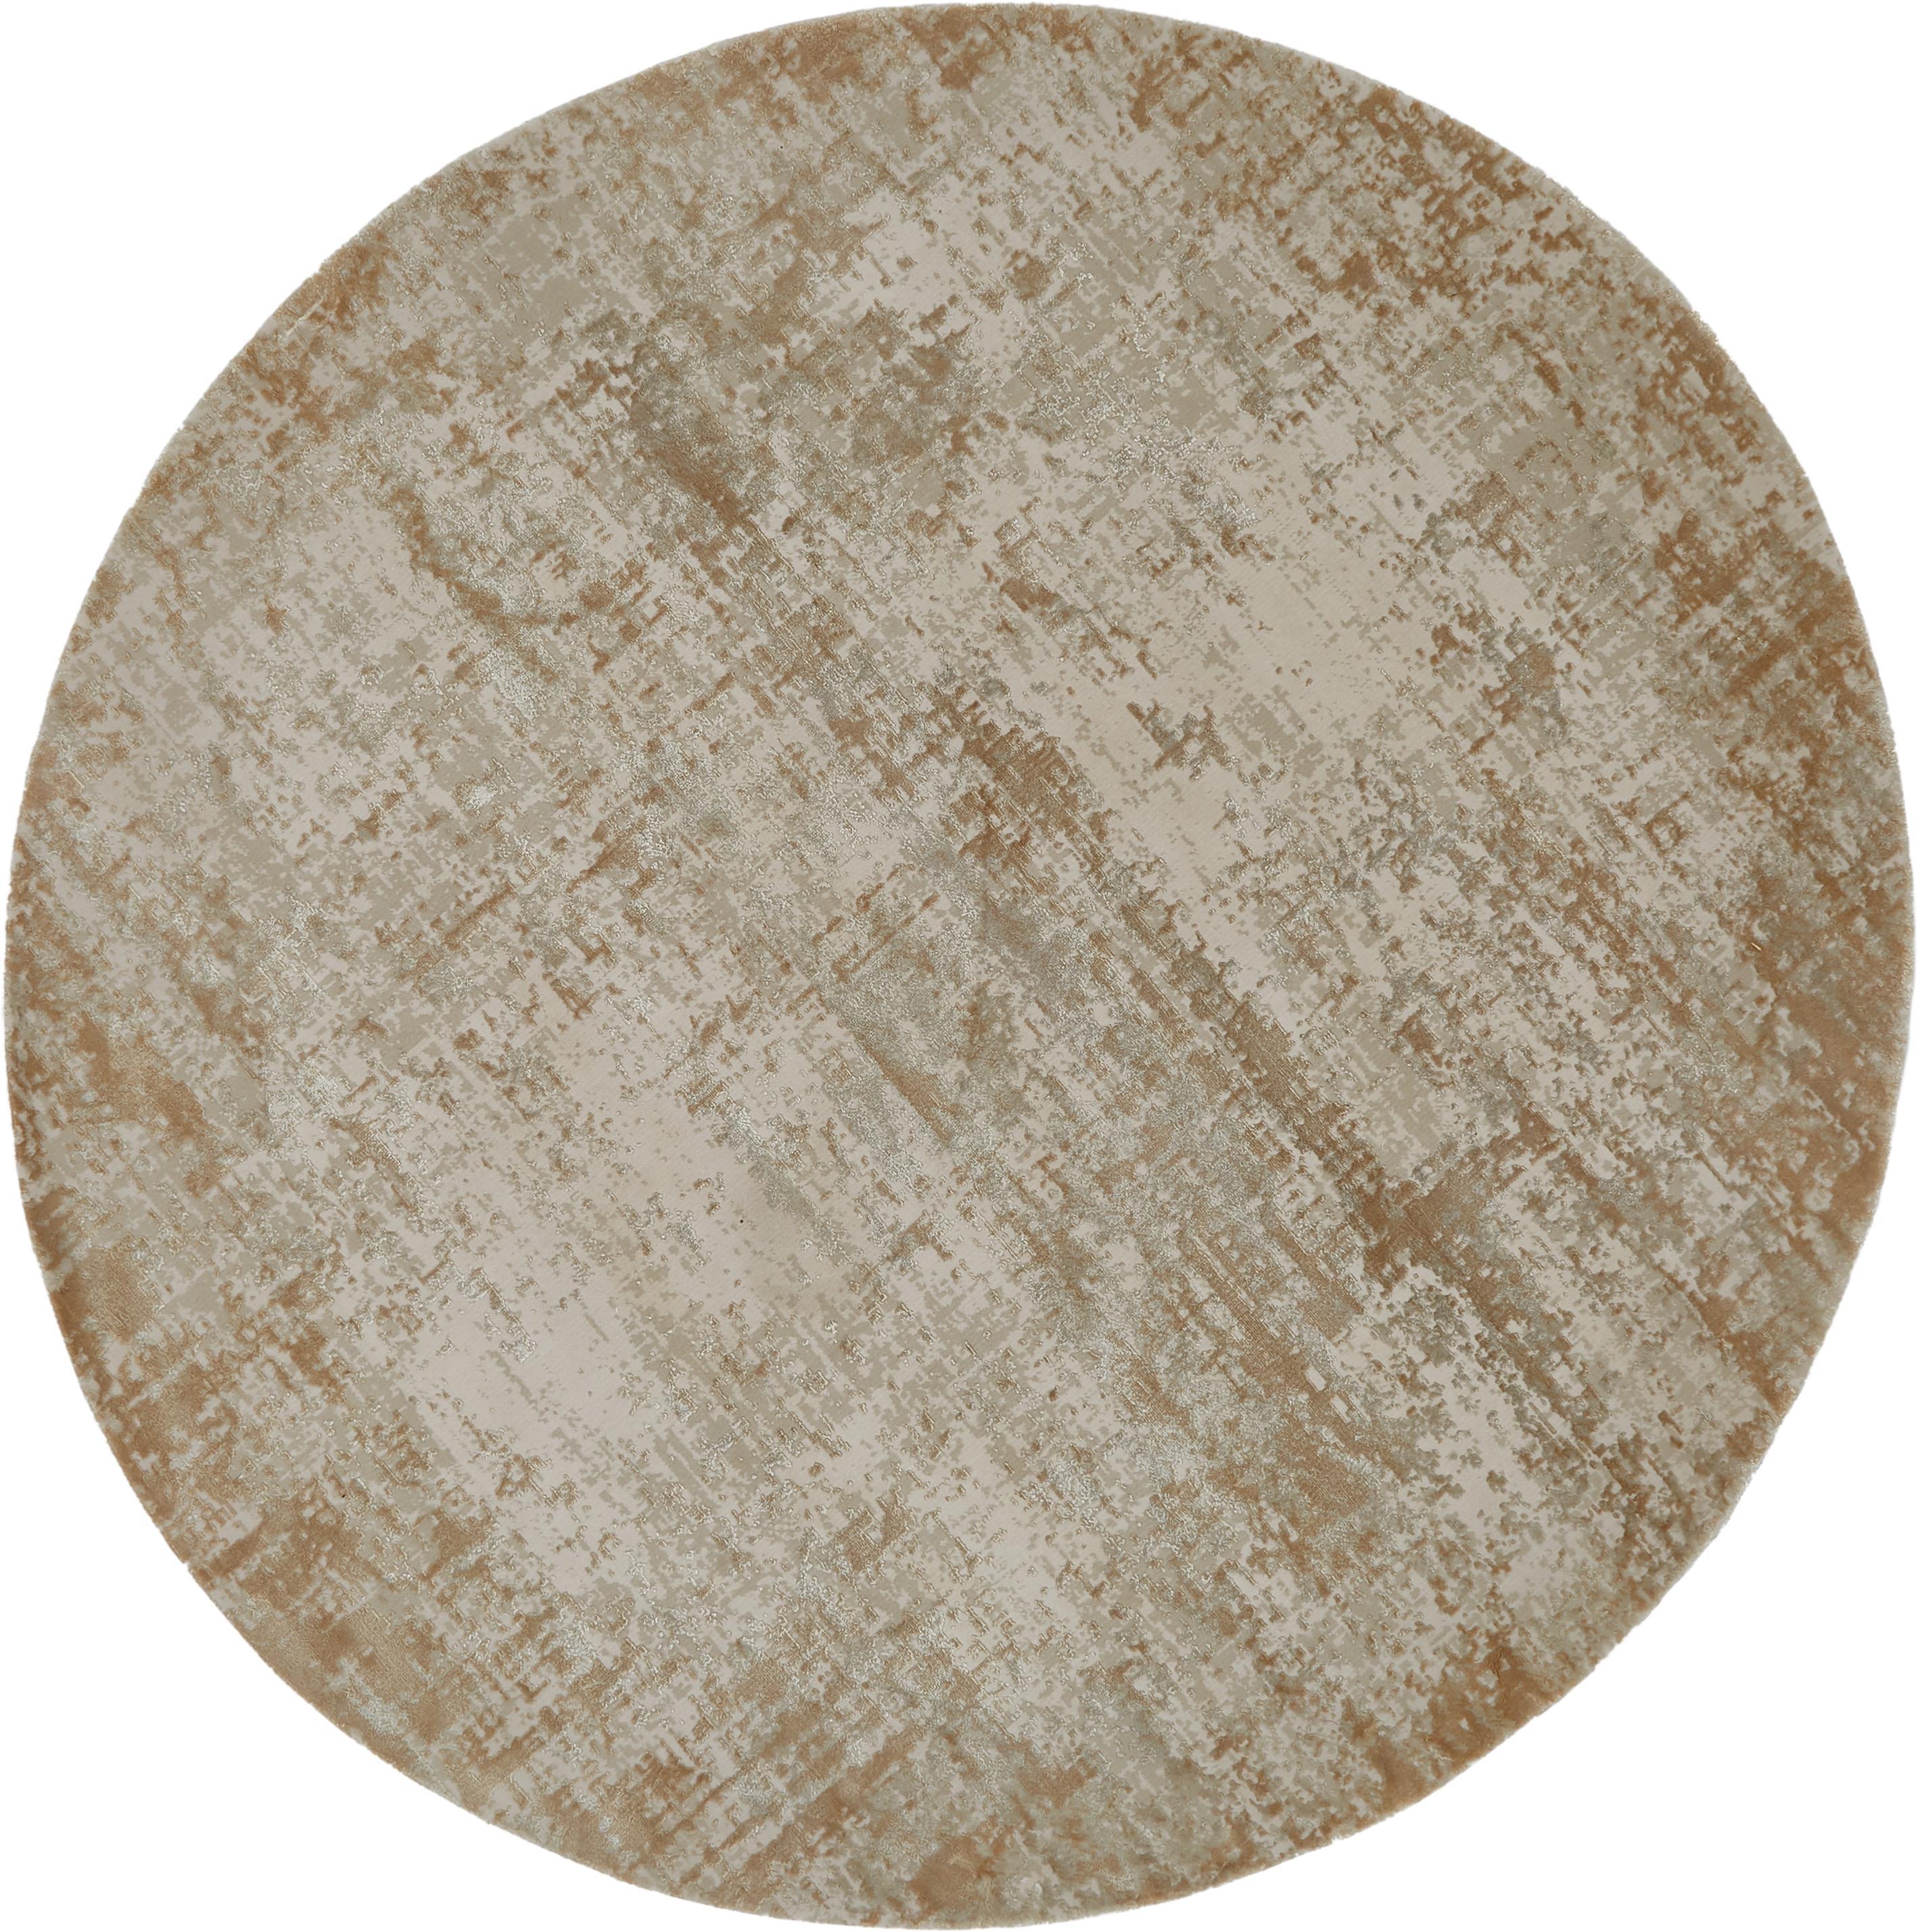 Runder Vintage Teppich Cordoba, schimmernd, Flor: 70% Acryl, 30% Viskose, Beigetöne, Ø 150 cm (Größe M)